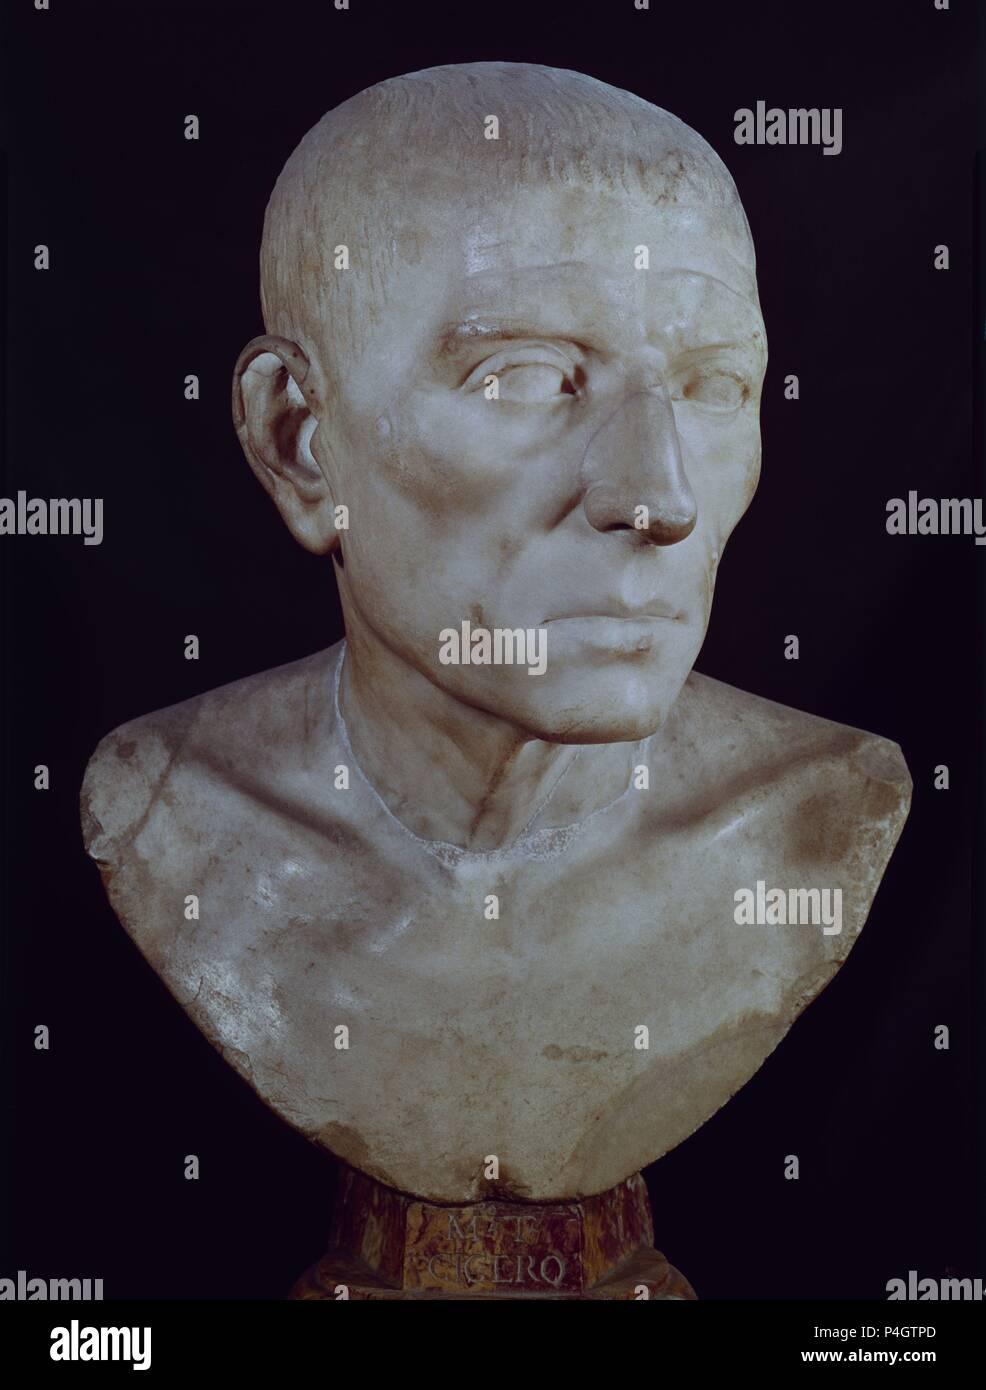 Cicerone catalina latino dating